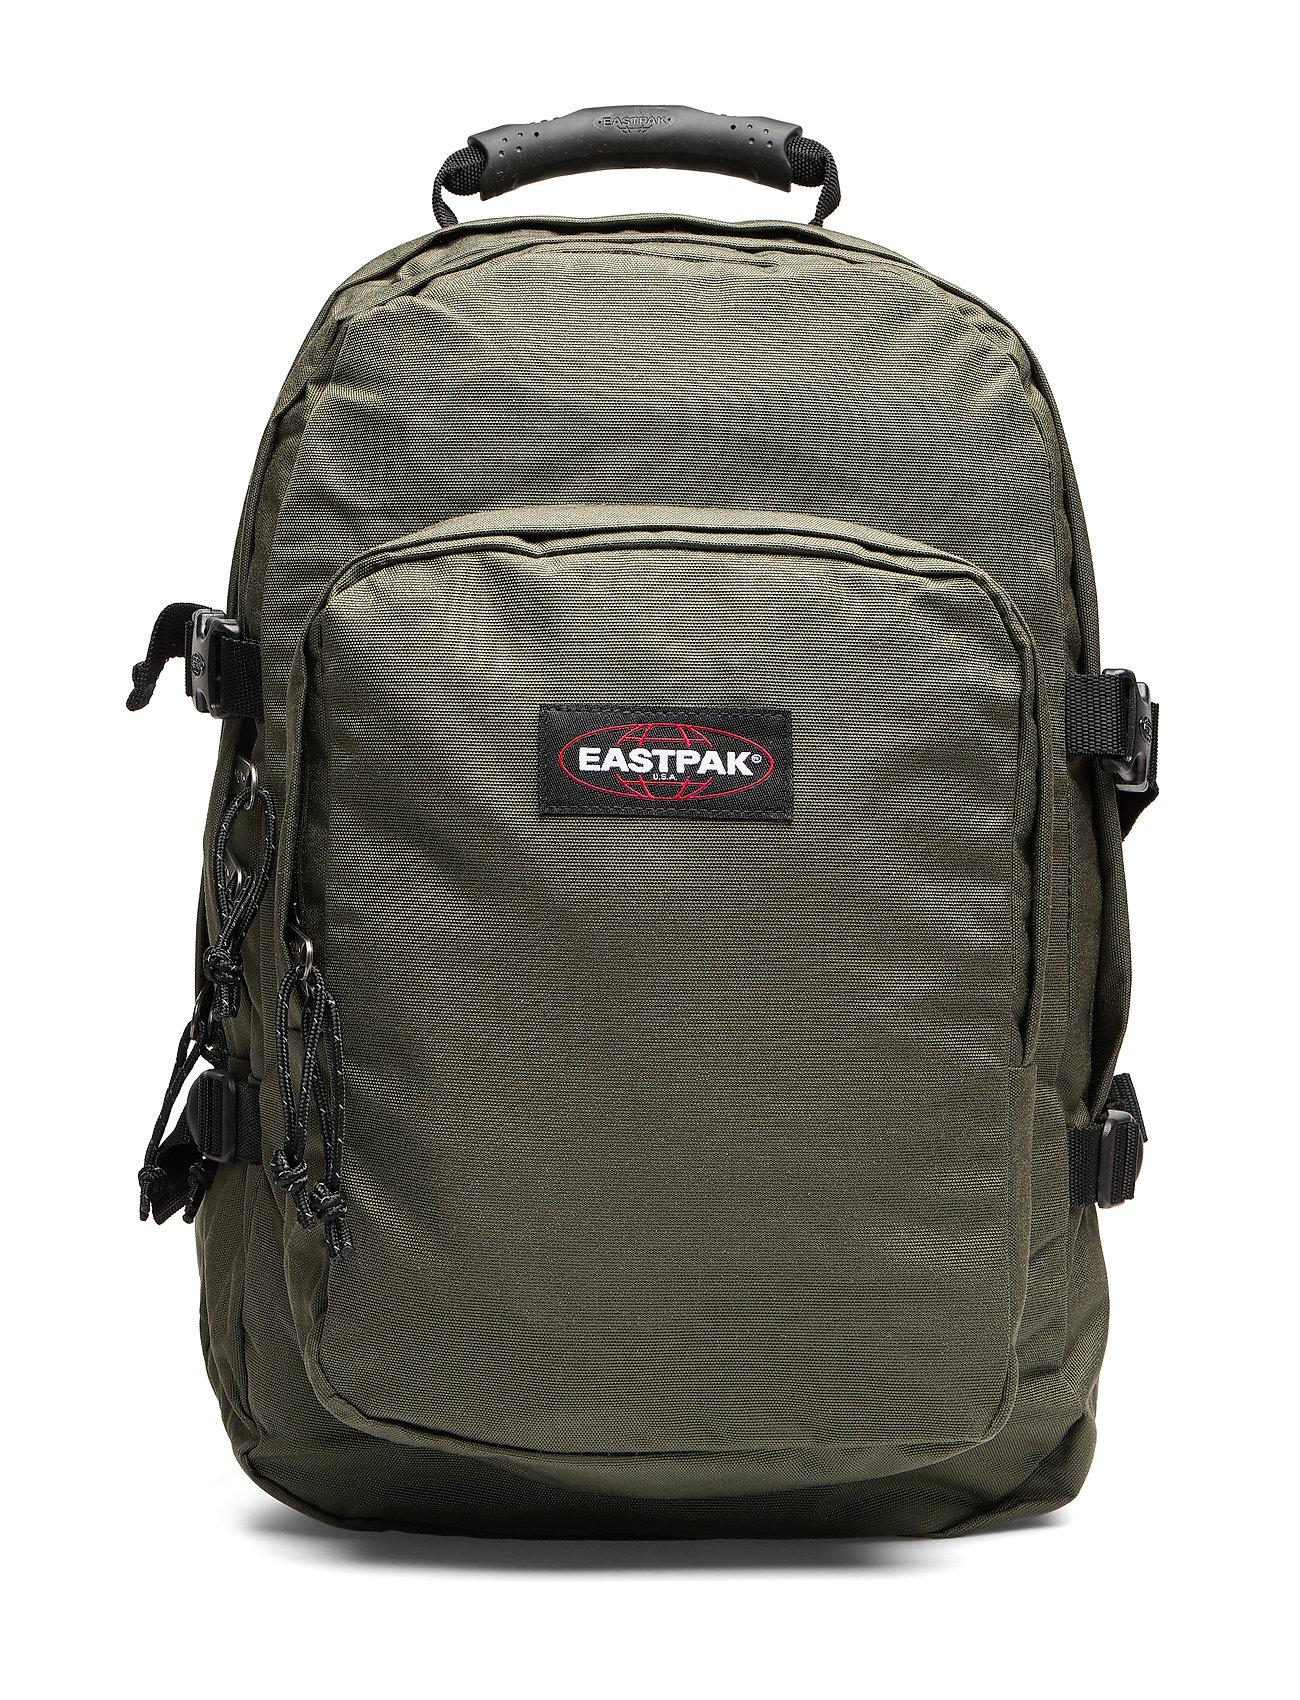 EASTPAK Provider Accessories Backpacks Grün EASTPAK